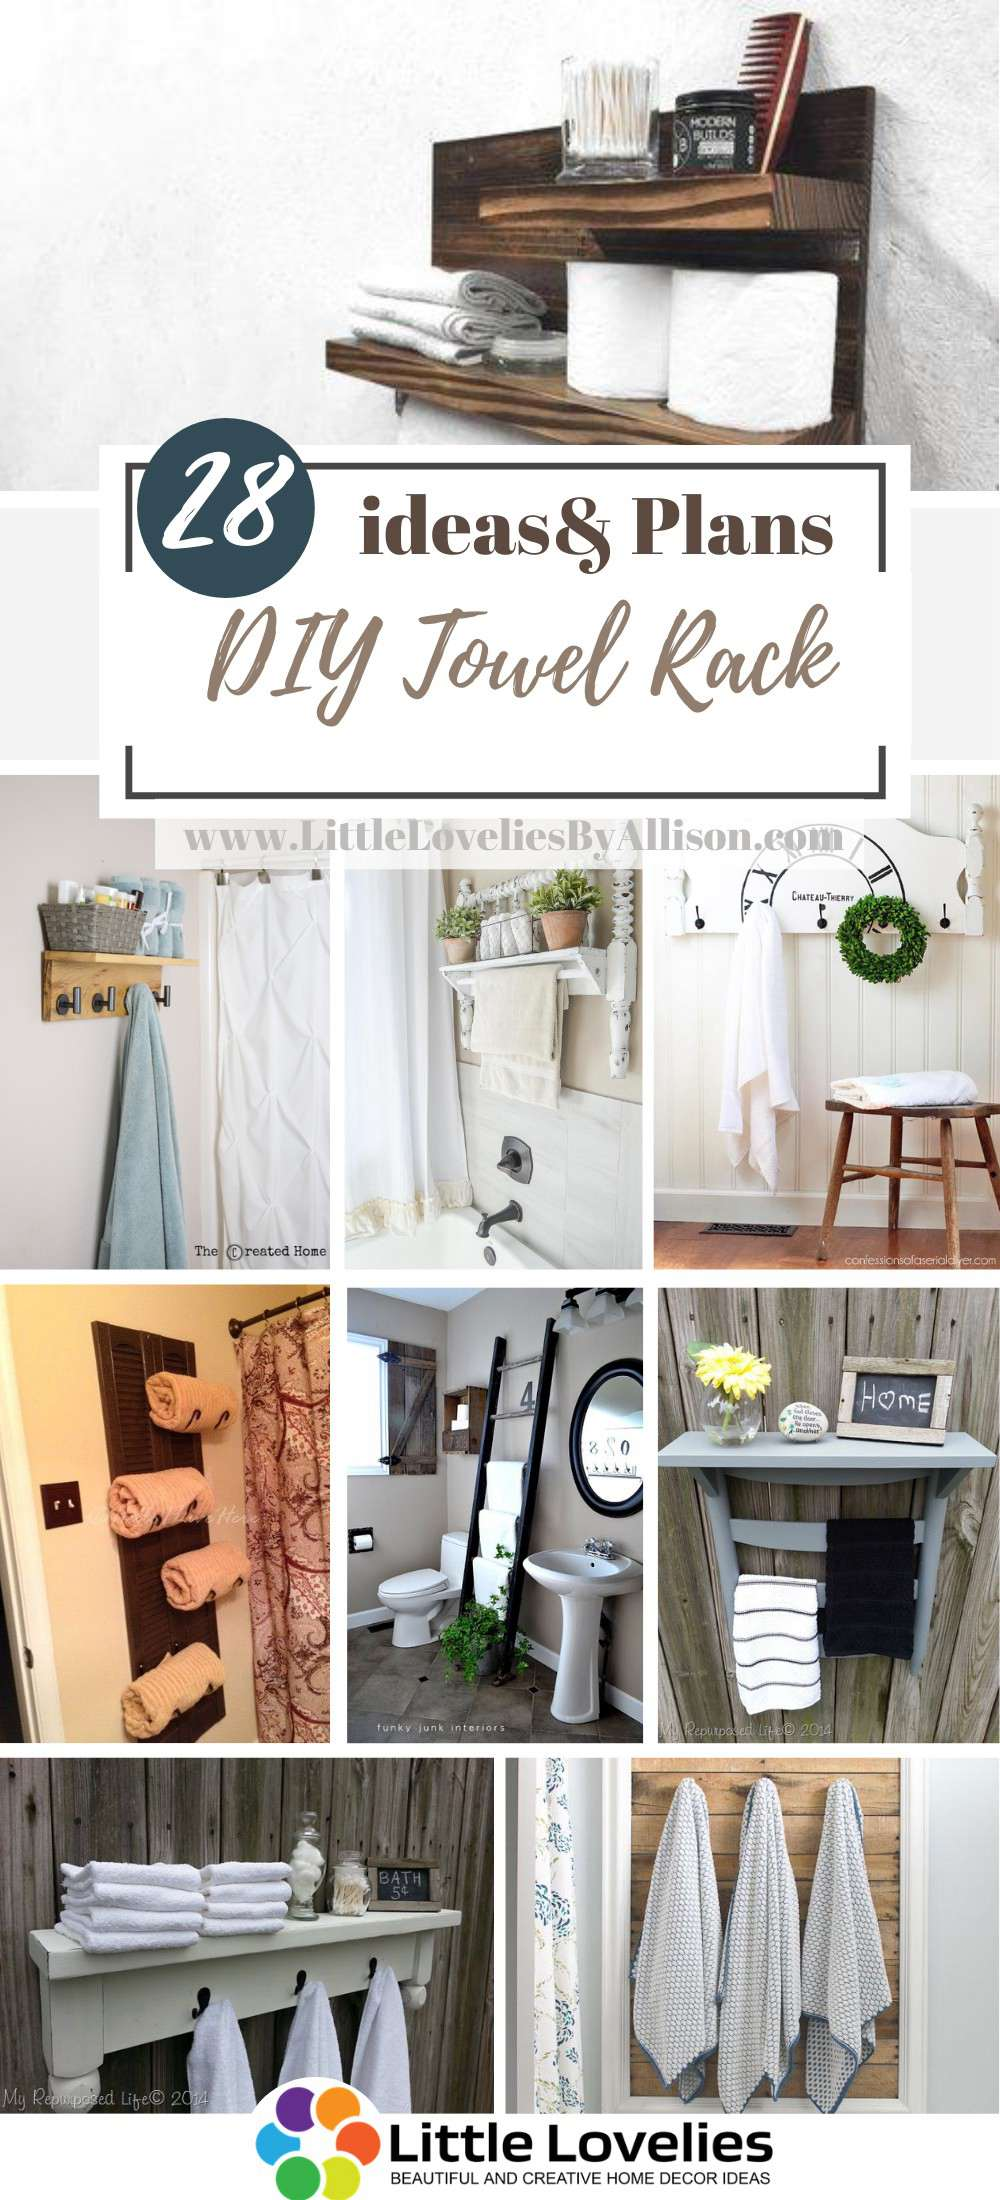 25 Diy Towel Rack For Classy And Rustic, Bathroom Shelves With Towel Bar Ideas